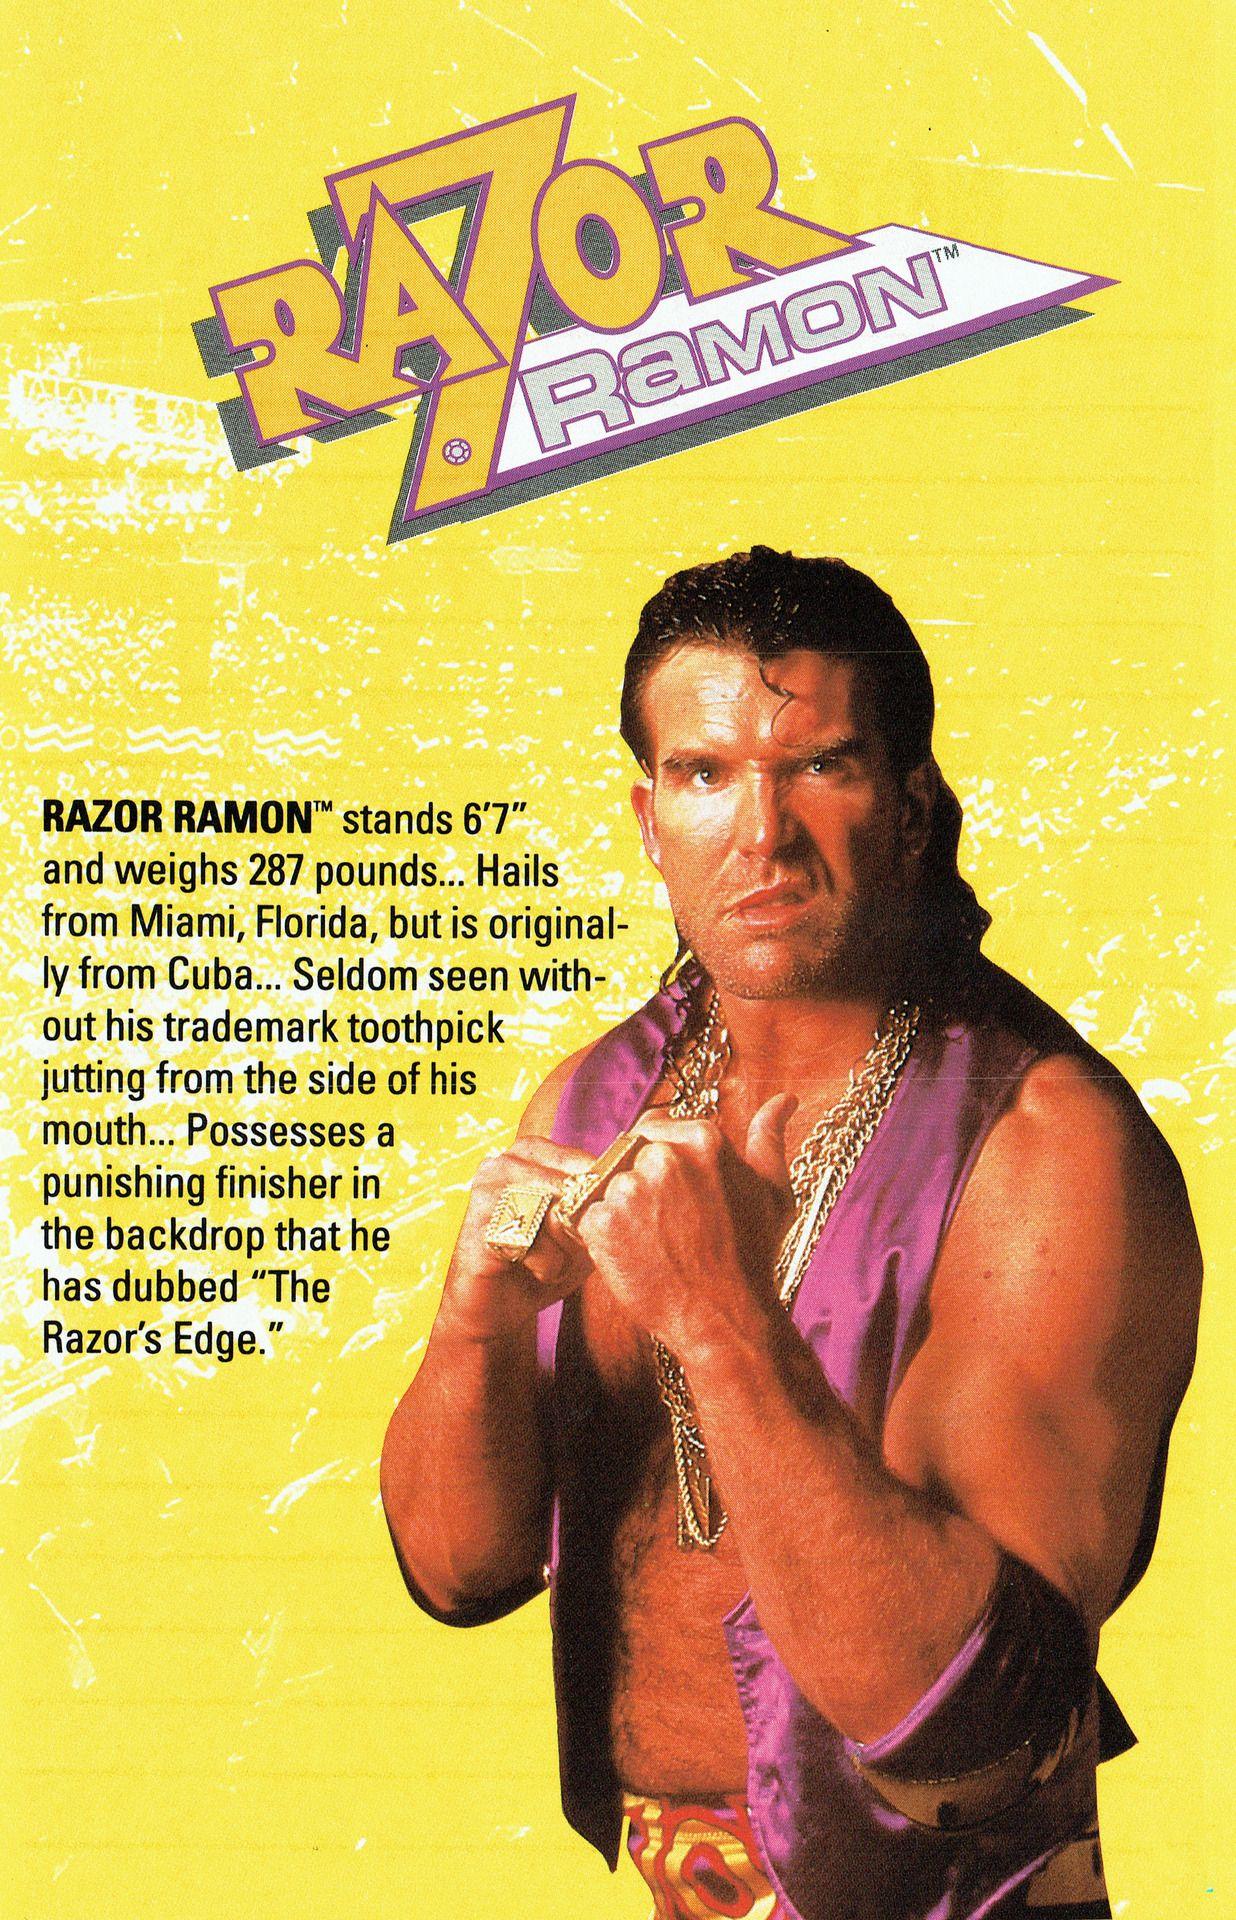 The Profile For Scotthallnwo From Wwf Royal Rumble For The Super Nintendo Wwe Wwf Superstars Wrestling Divas Wrestling Superstars